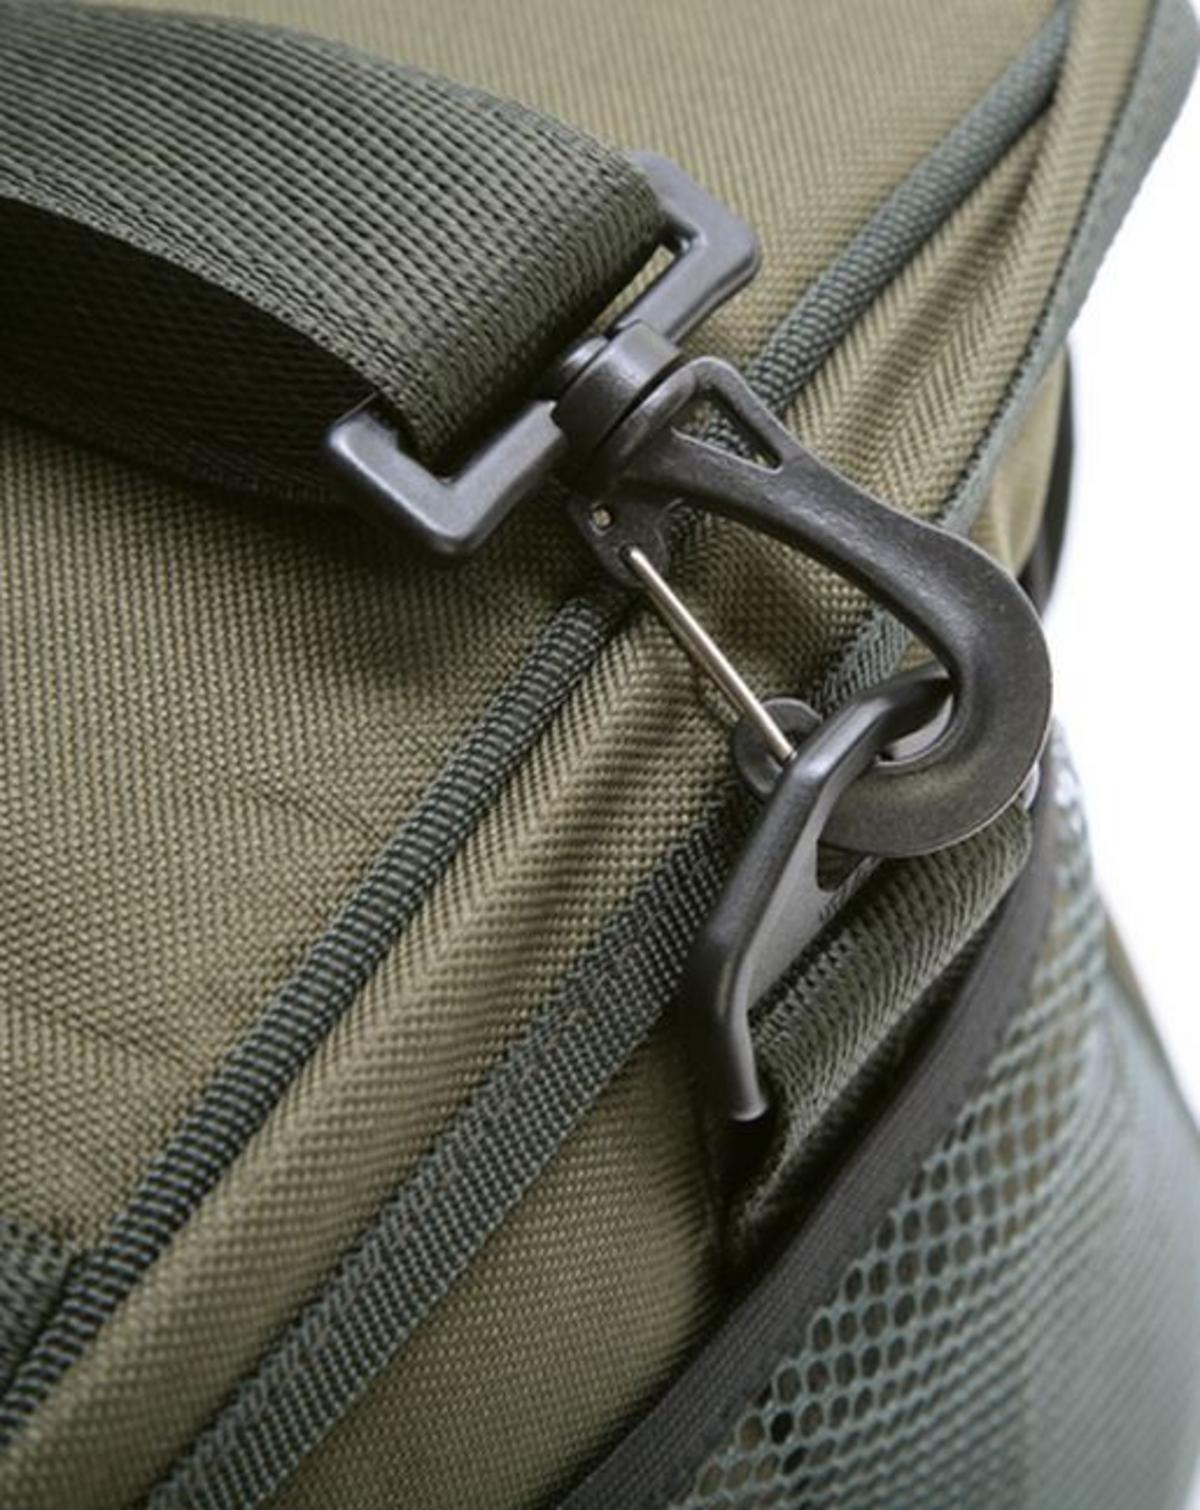 New Daiwa Infinity 174 Cooler Bag Model No Dicb1 Carp